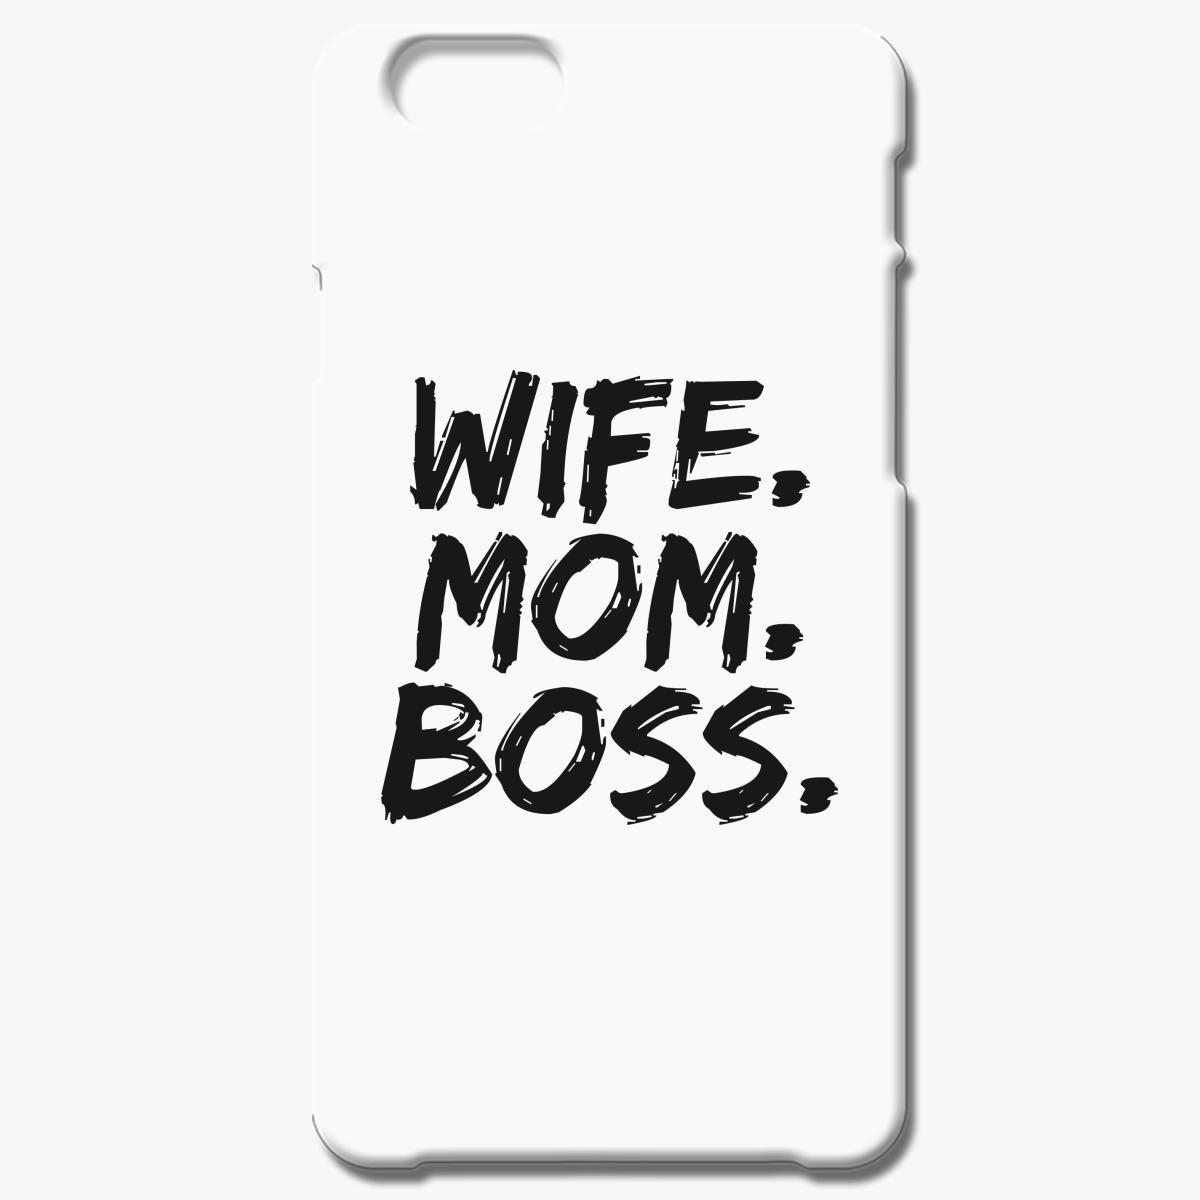 Wife Mom Boss Iphone 6 6s Plus Case